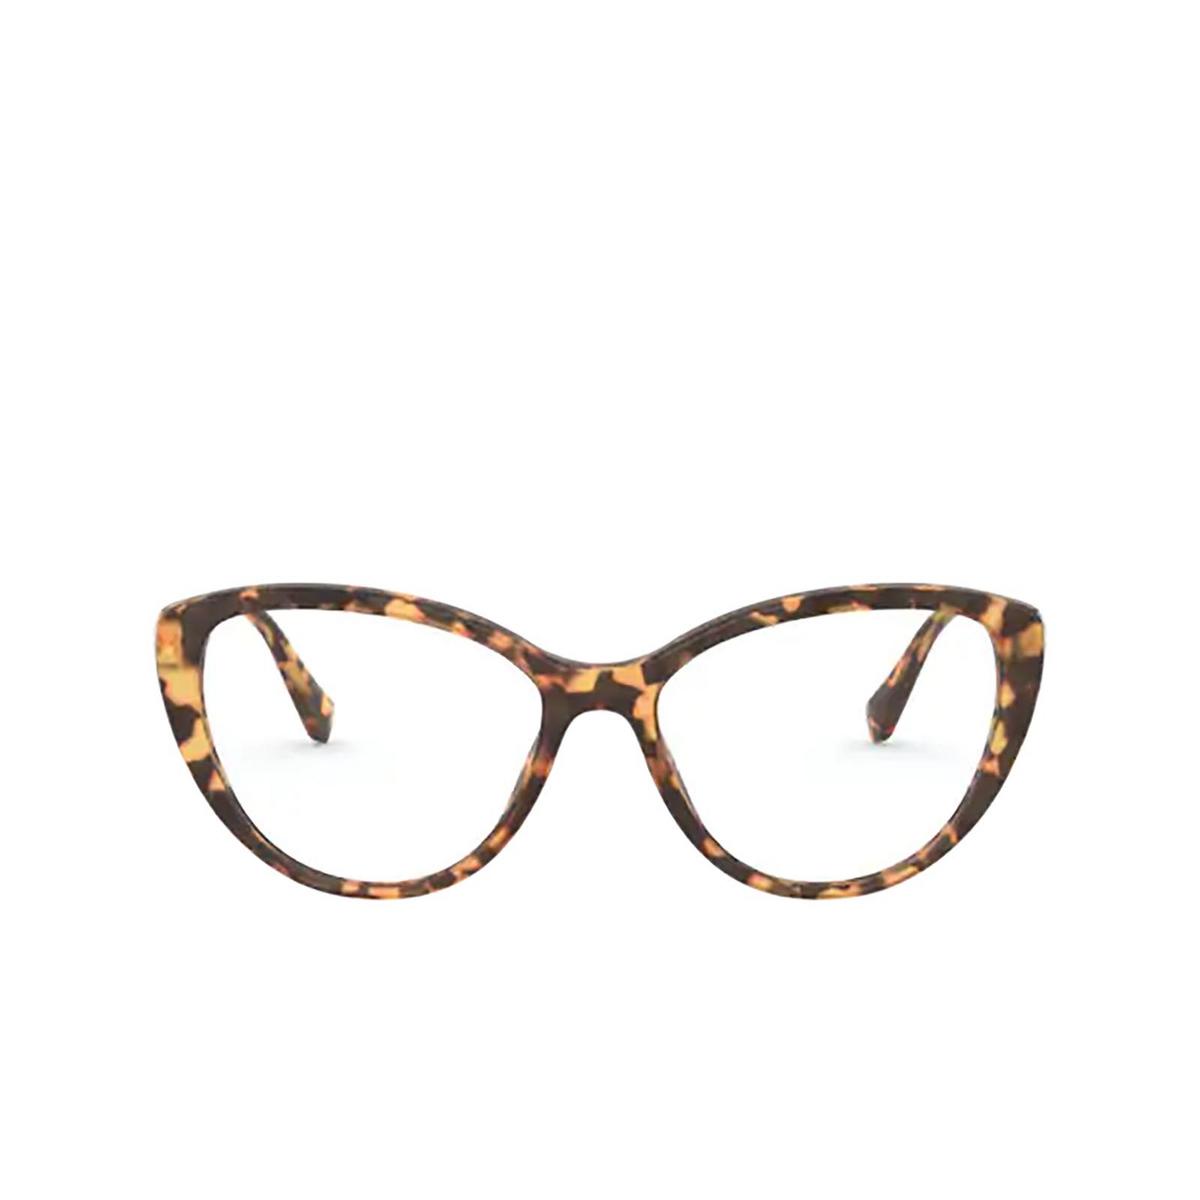 Miu Miu® Cat-eye Eyeglasses: MU 02SV color Light Havana 7S01O1 - front view.